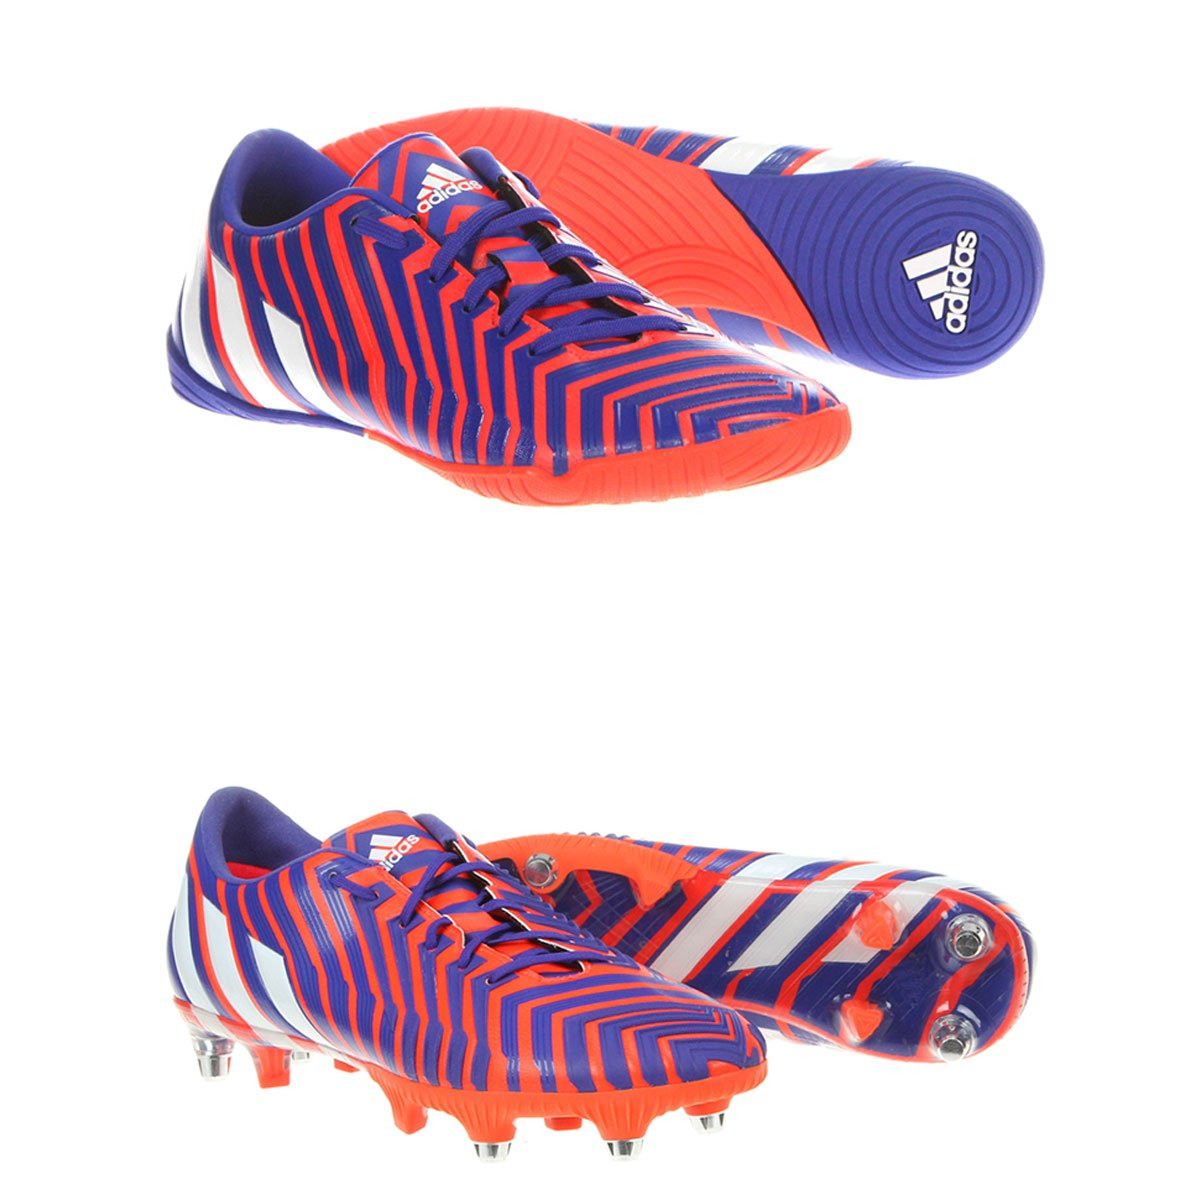 adb80689fab92 Kit Chuteira Adidas Predator Instinct SG Campo + Chuteira Adidas Absolado  Instinct IN Futsal - Compre Agora